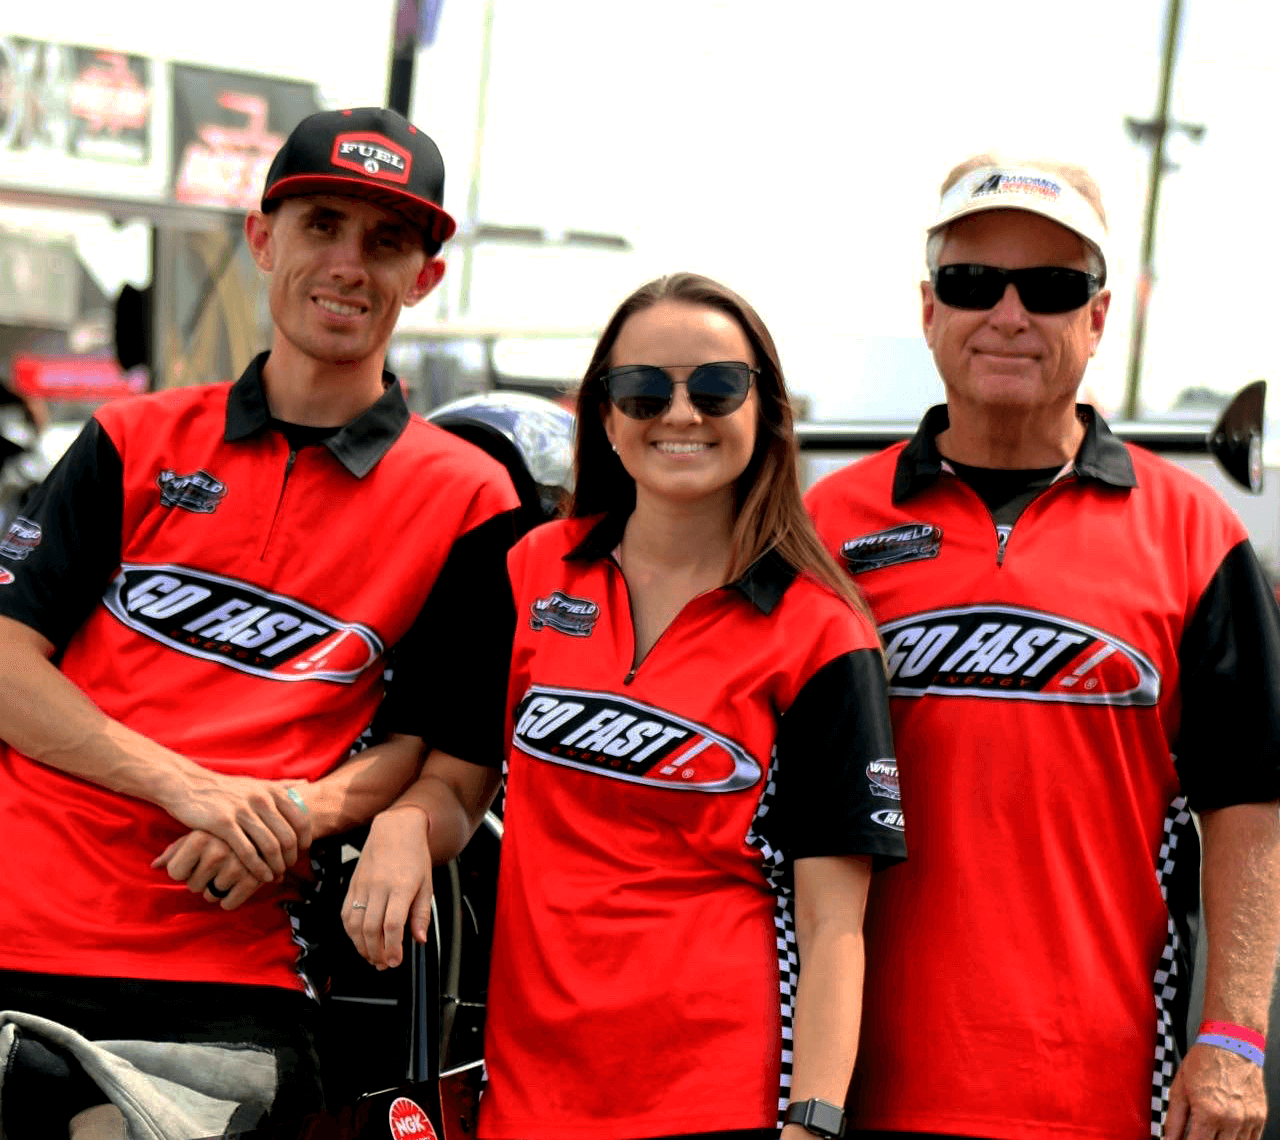 race team wearing GoFast! shirts